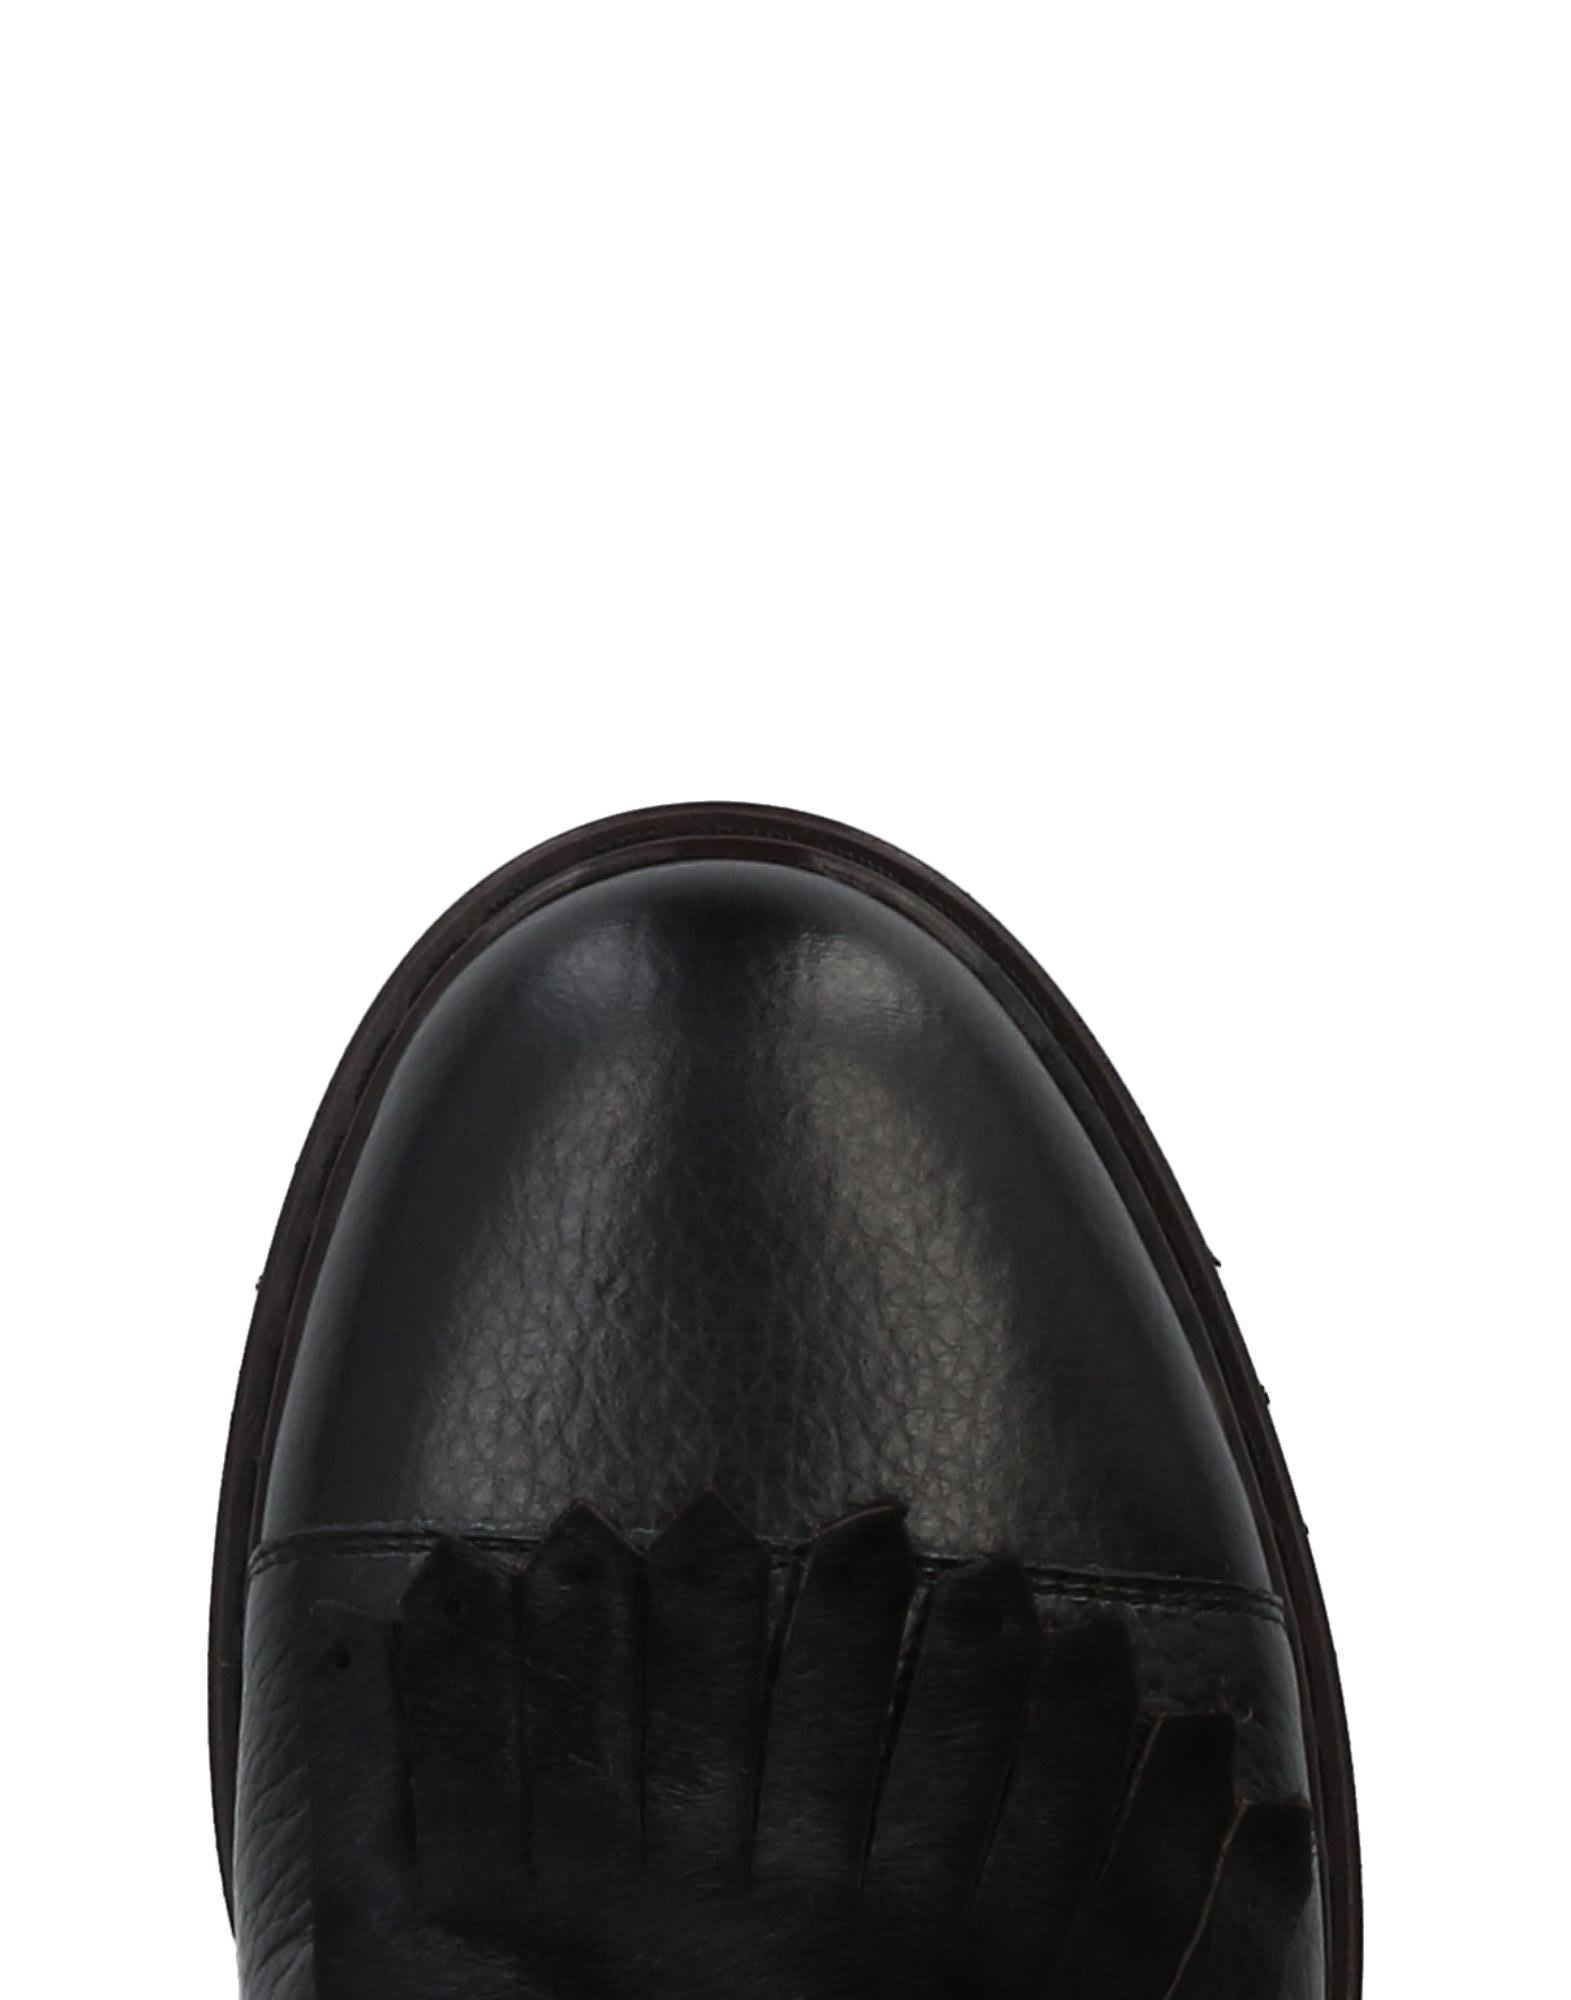 Emanuela Passeri Mokassins Qualität Damen  11444499TF Gute Qualität Mokassins beliebte Schuhe 06c58b